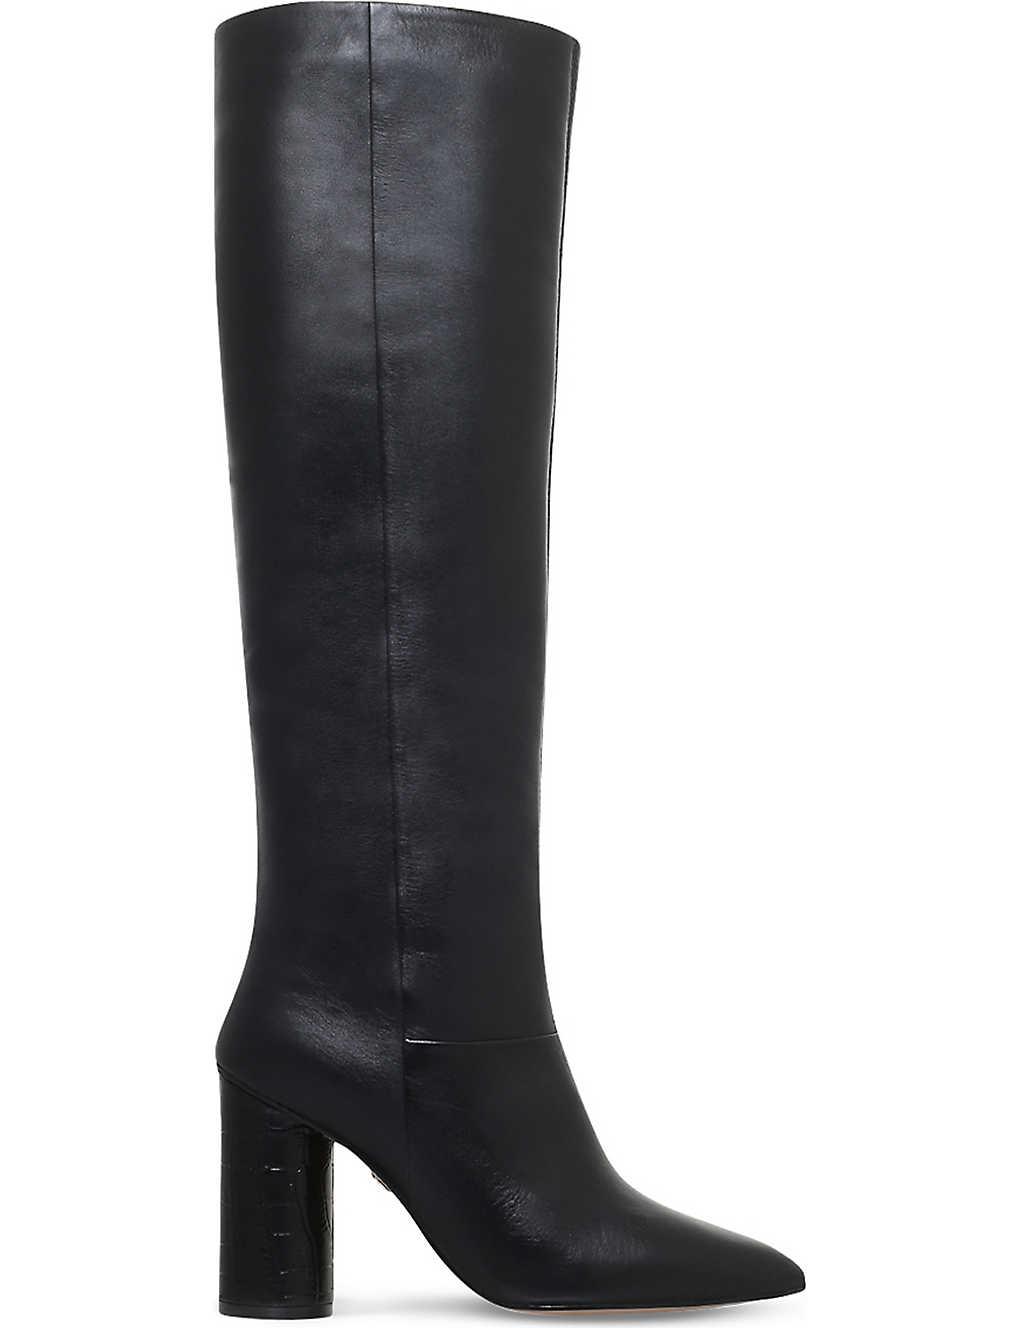 KG KURT GEIGER Trance leather knee-high boots